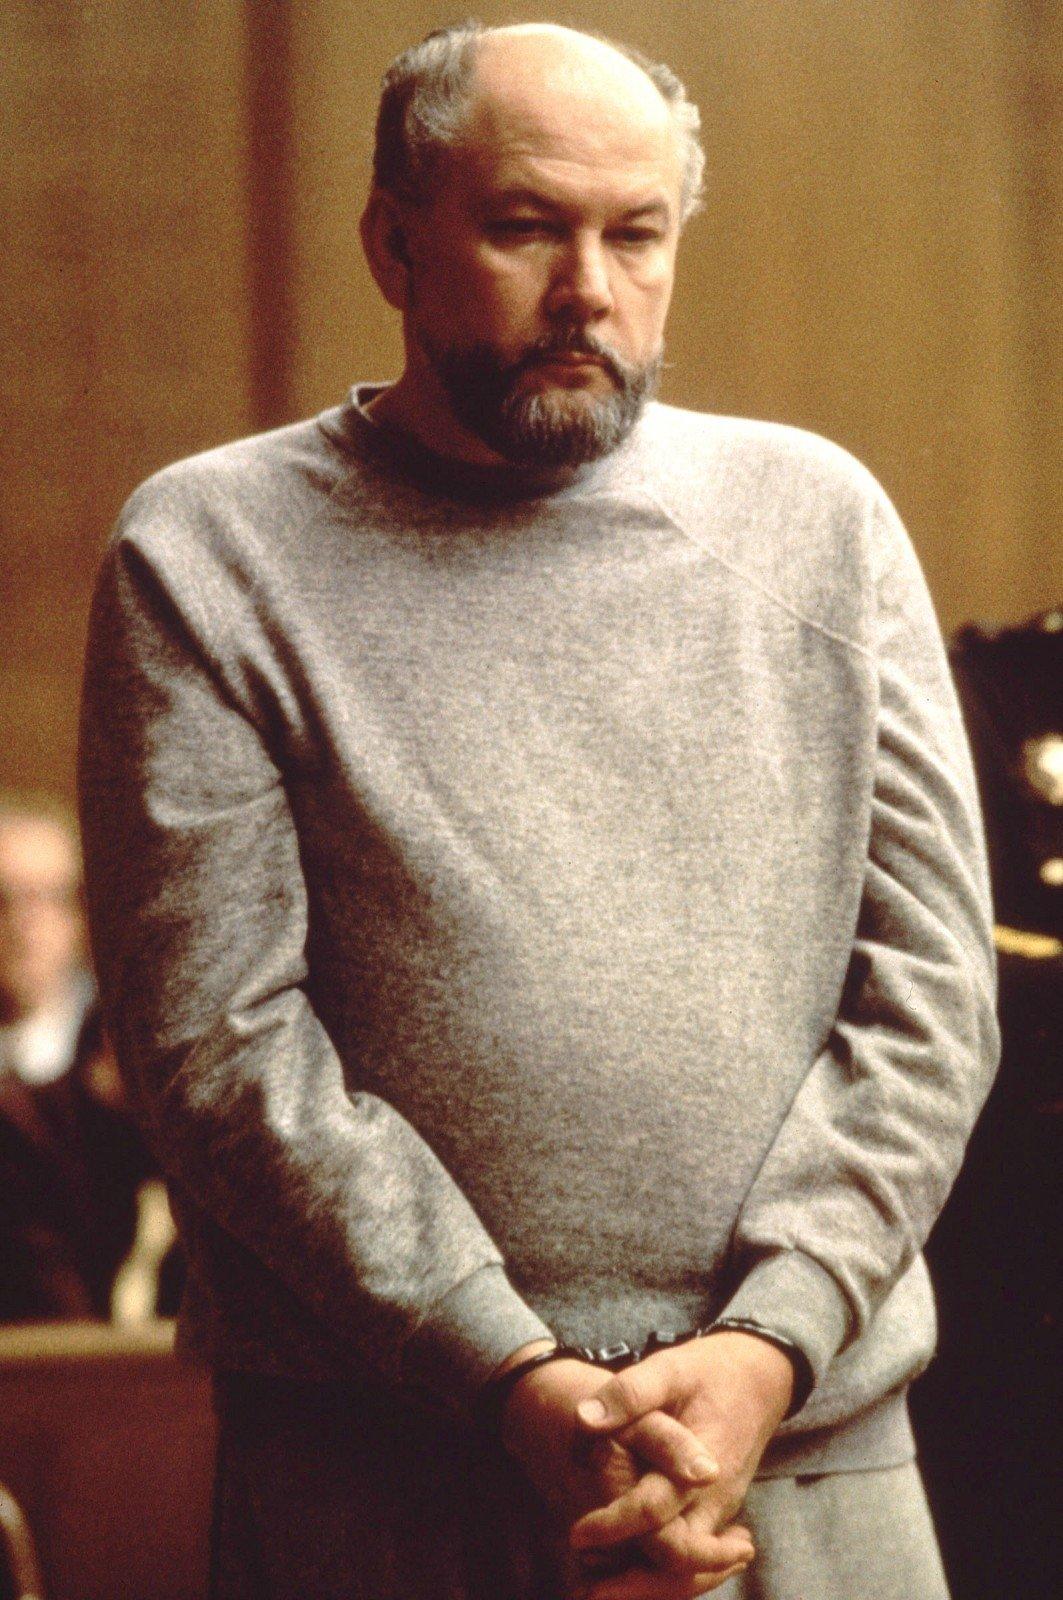 Richard kuklinski death photo